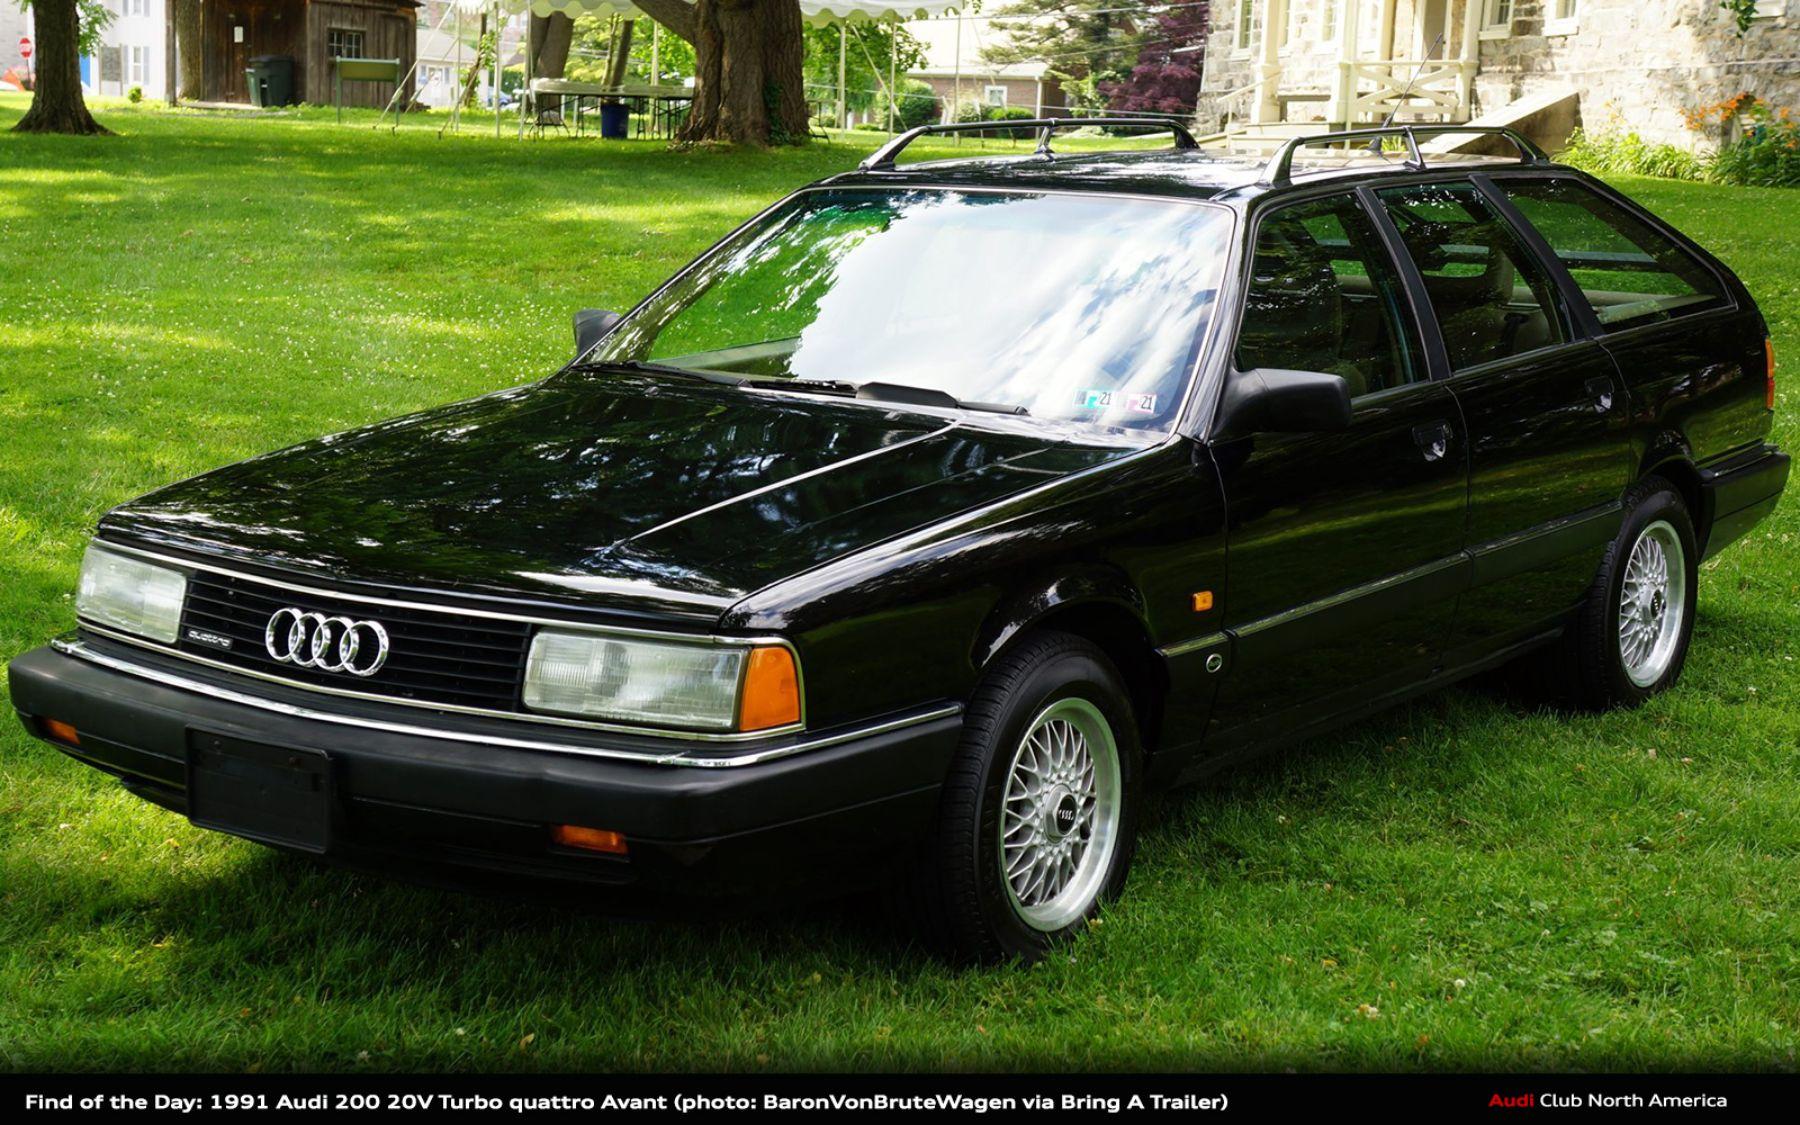 Find of the Day: 1991 Audi 20V Turbo quattro Avant